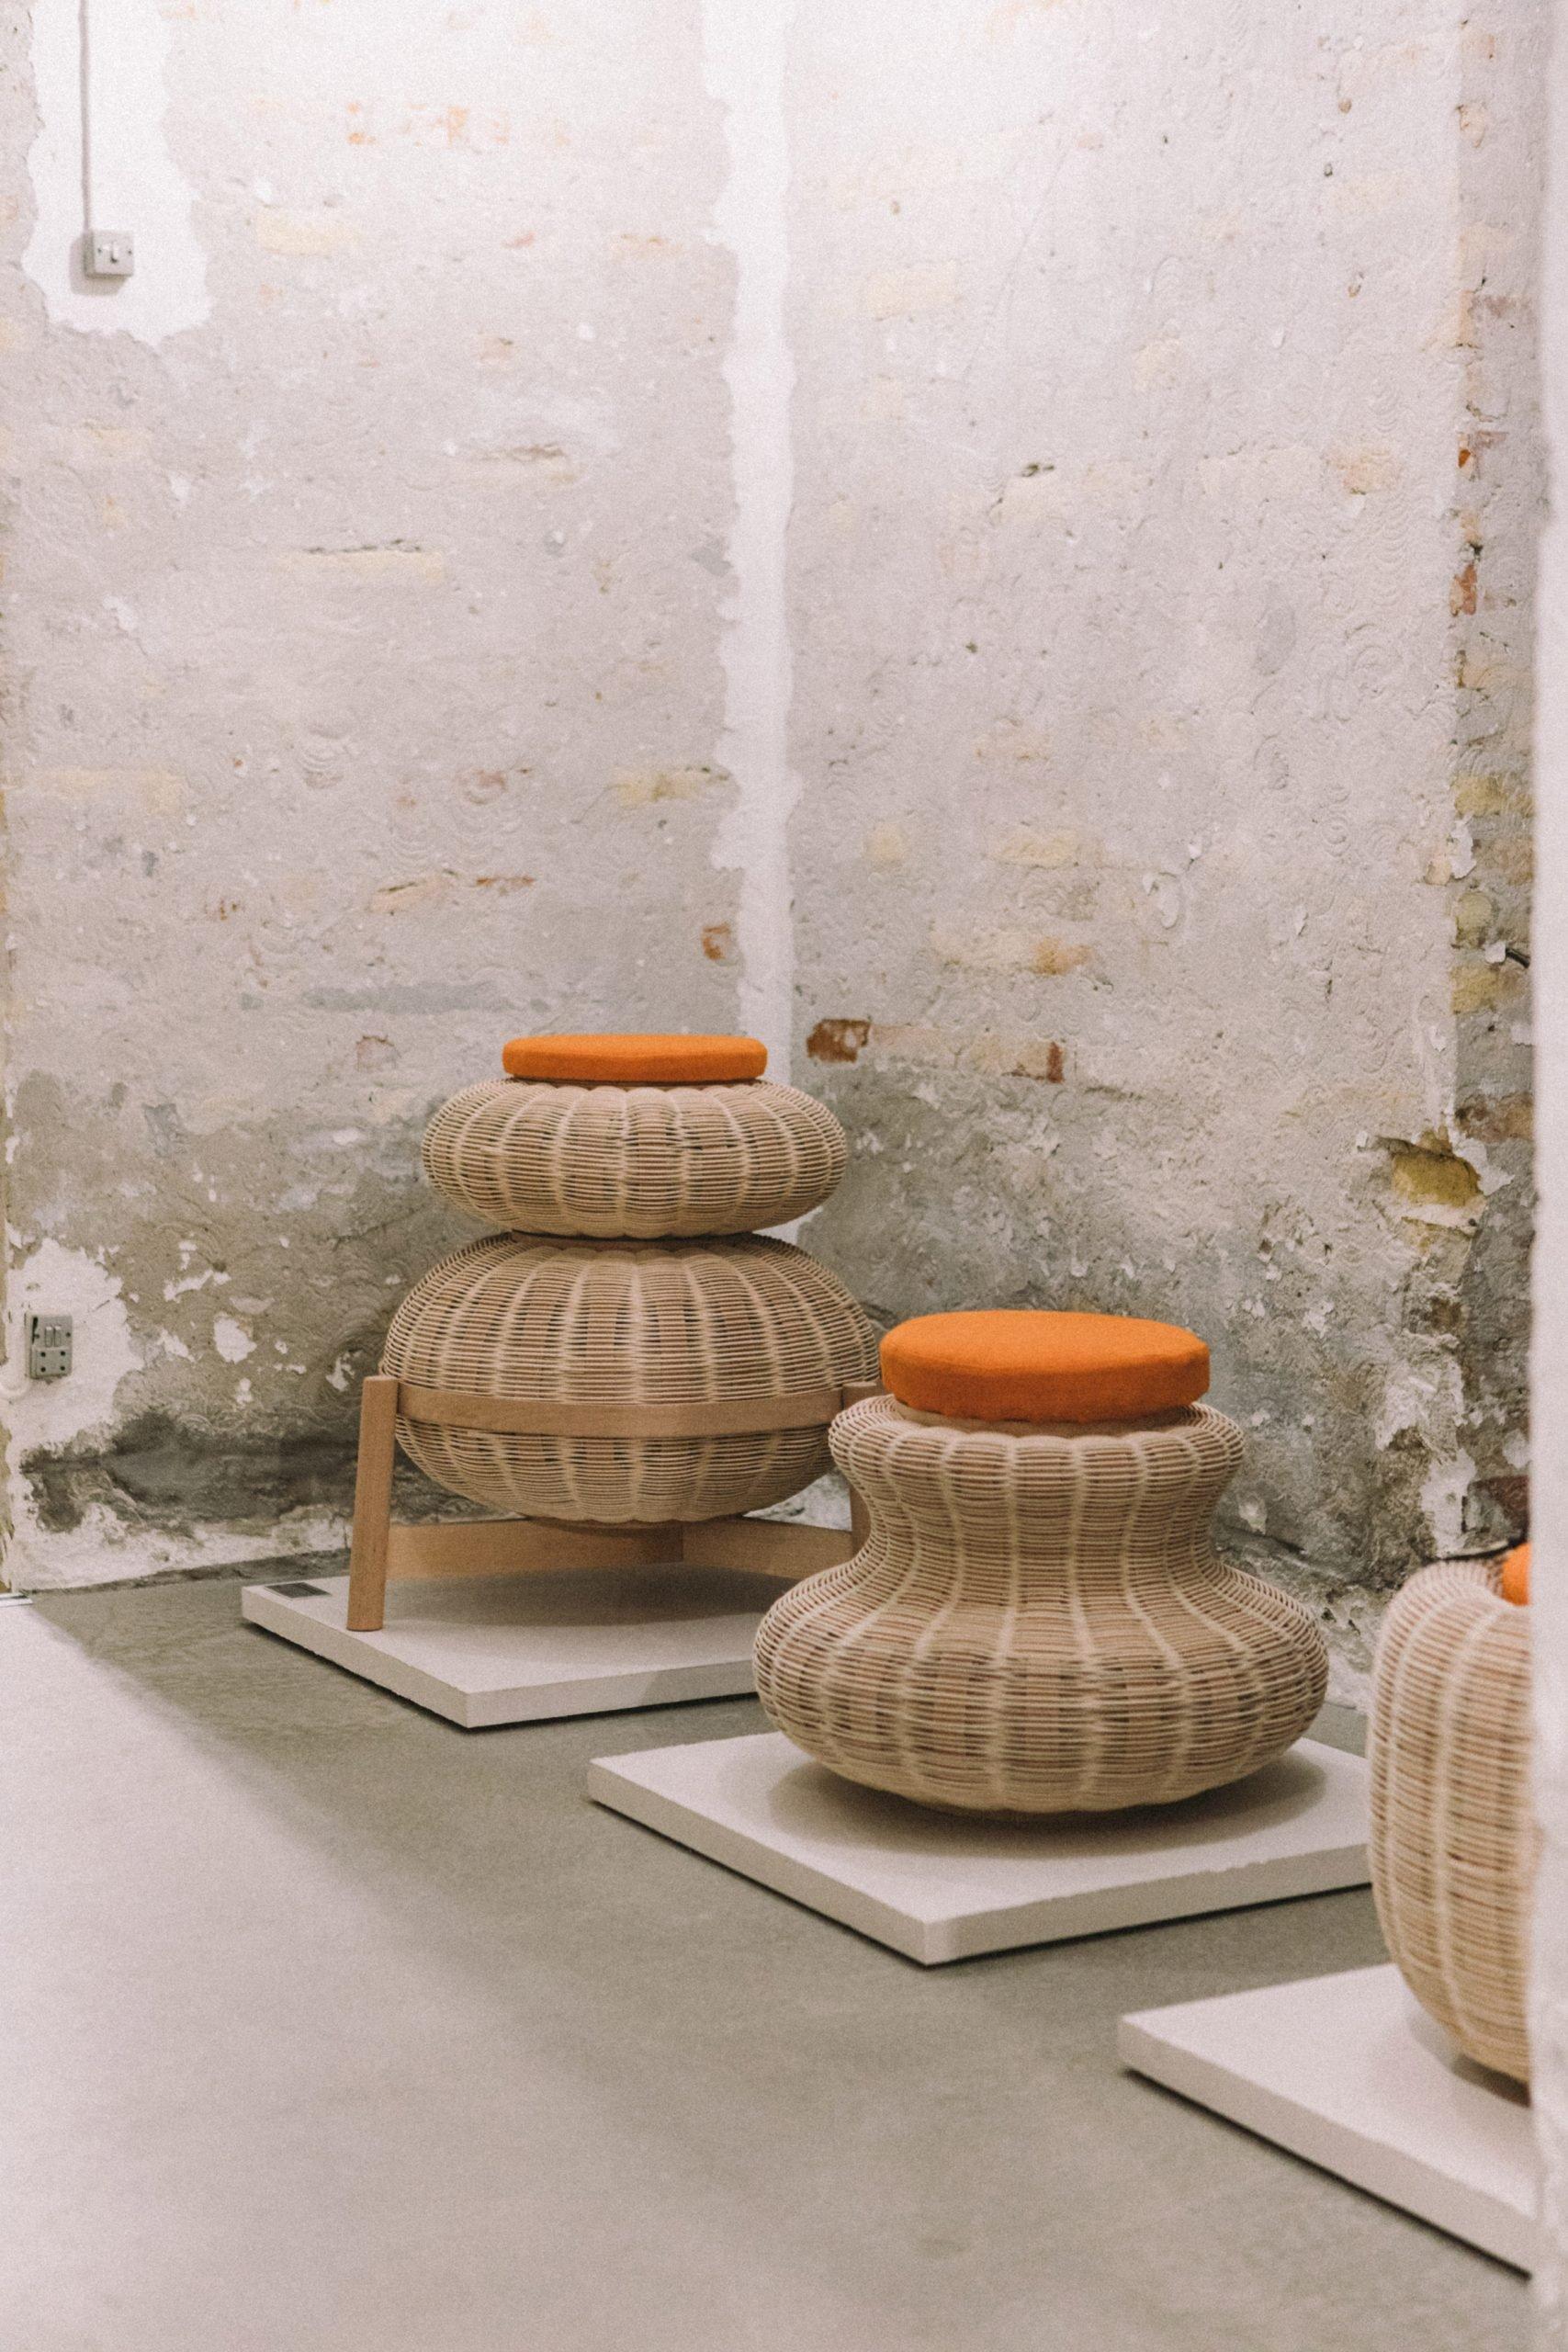 Fellah wicker stool by Sia Hurtigkarl Degel and Pia Angela Rasmussen